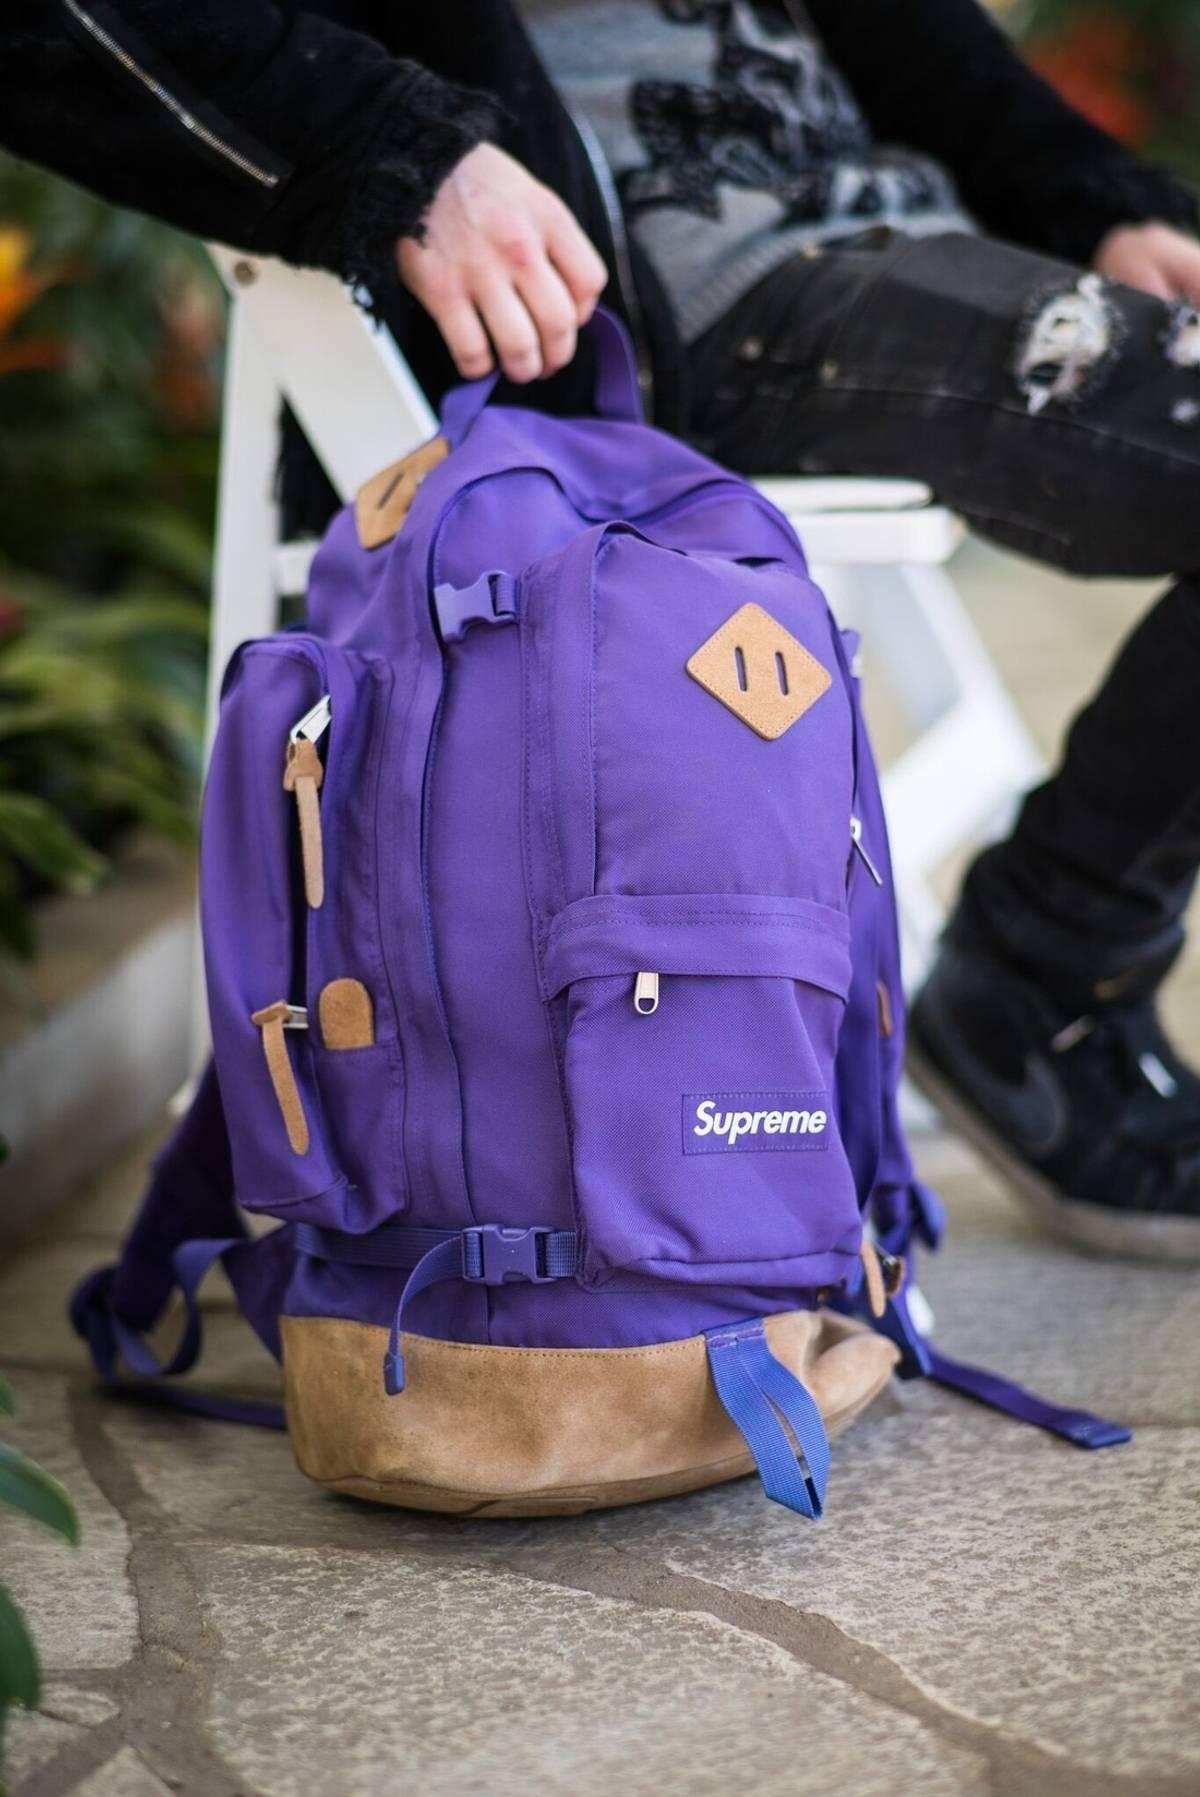 e977b132ec1 Supreme 2006 Purple Backpack Size One Size $585